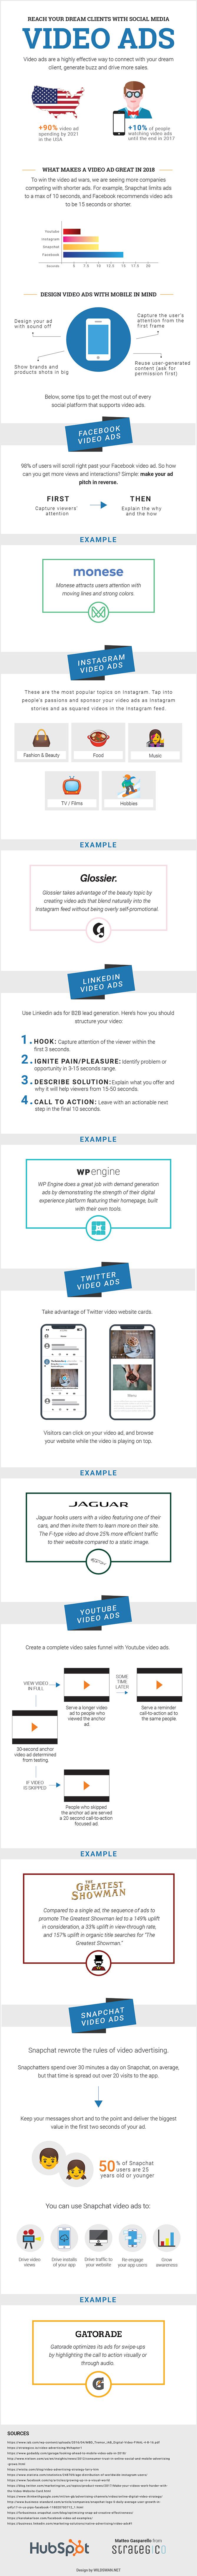 video-ads-ig